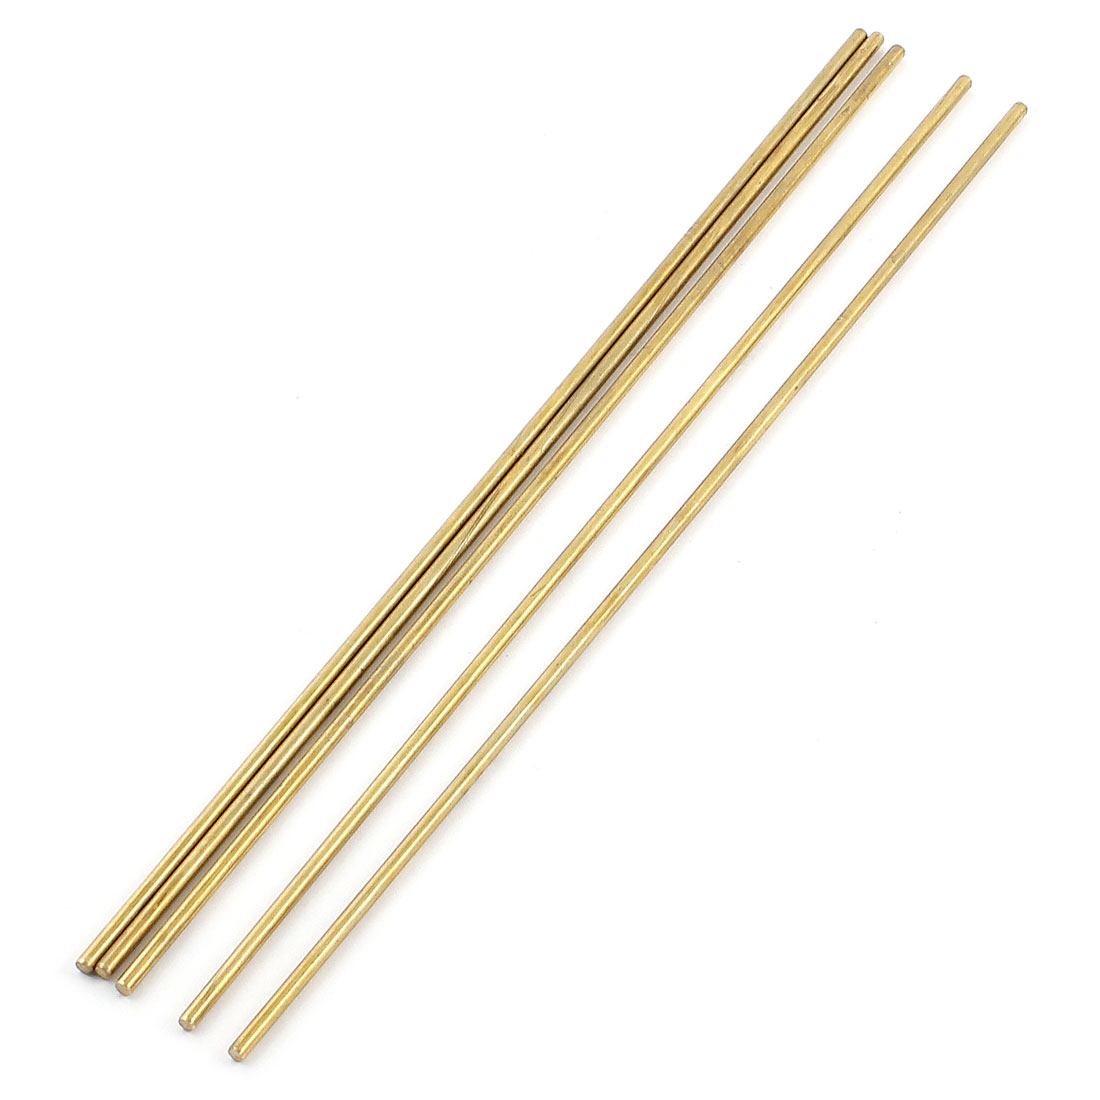 Unique Bargains 5 Pcs 3mm x 250mm Brass Solid Rod Lathe Bar Stock Tool